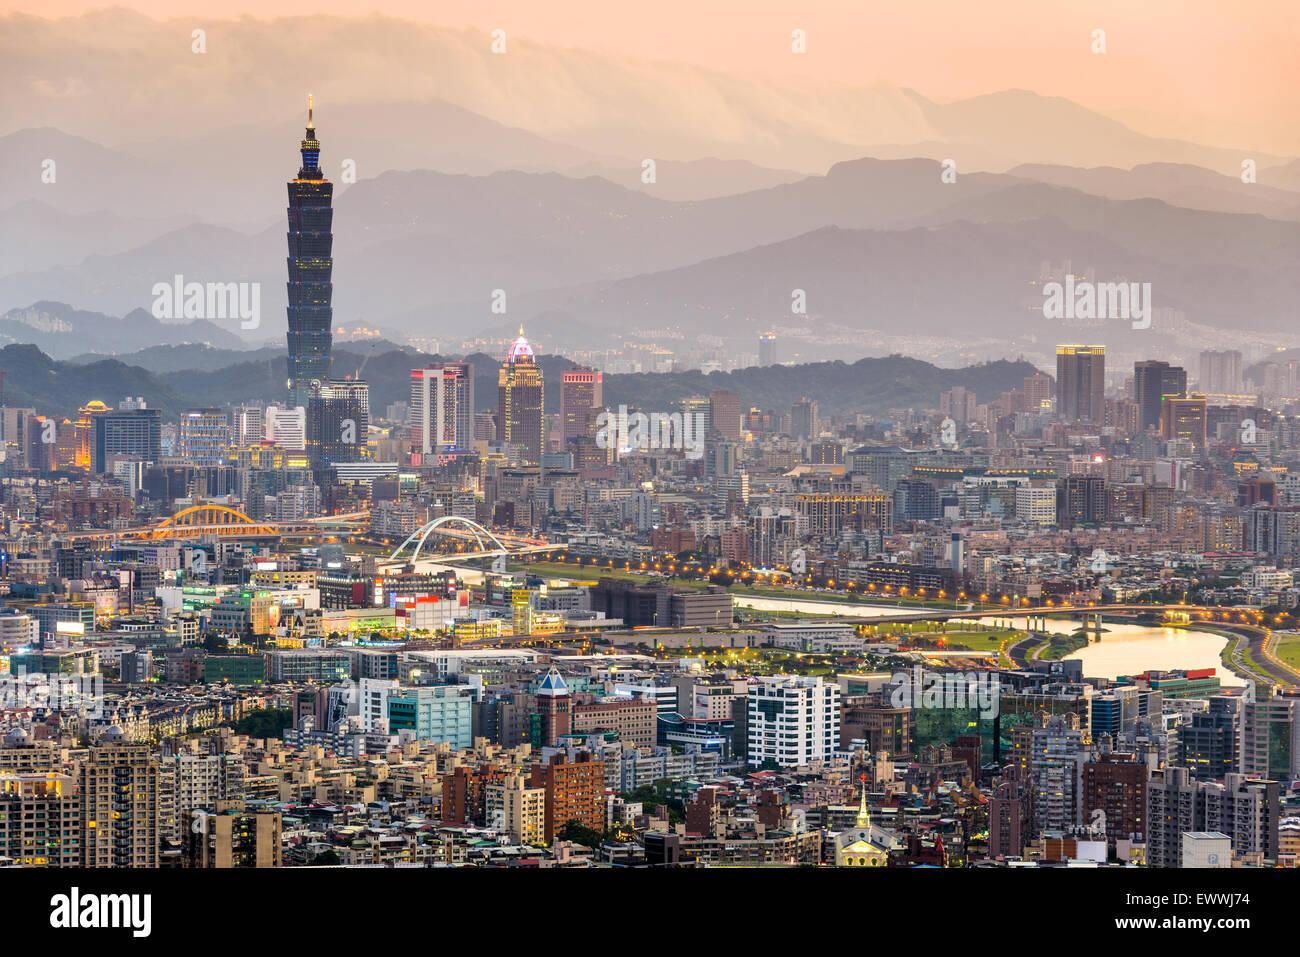 Taipei, Taïwan sur les toits de la ville. Photo Stock